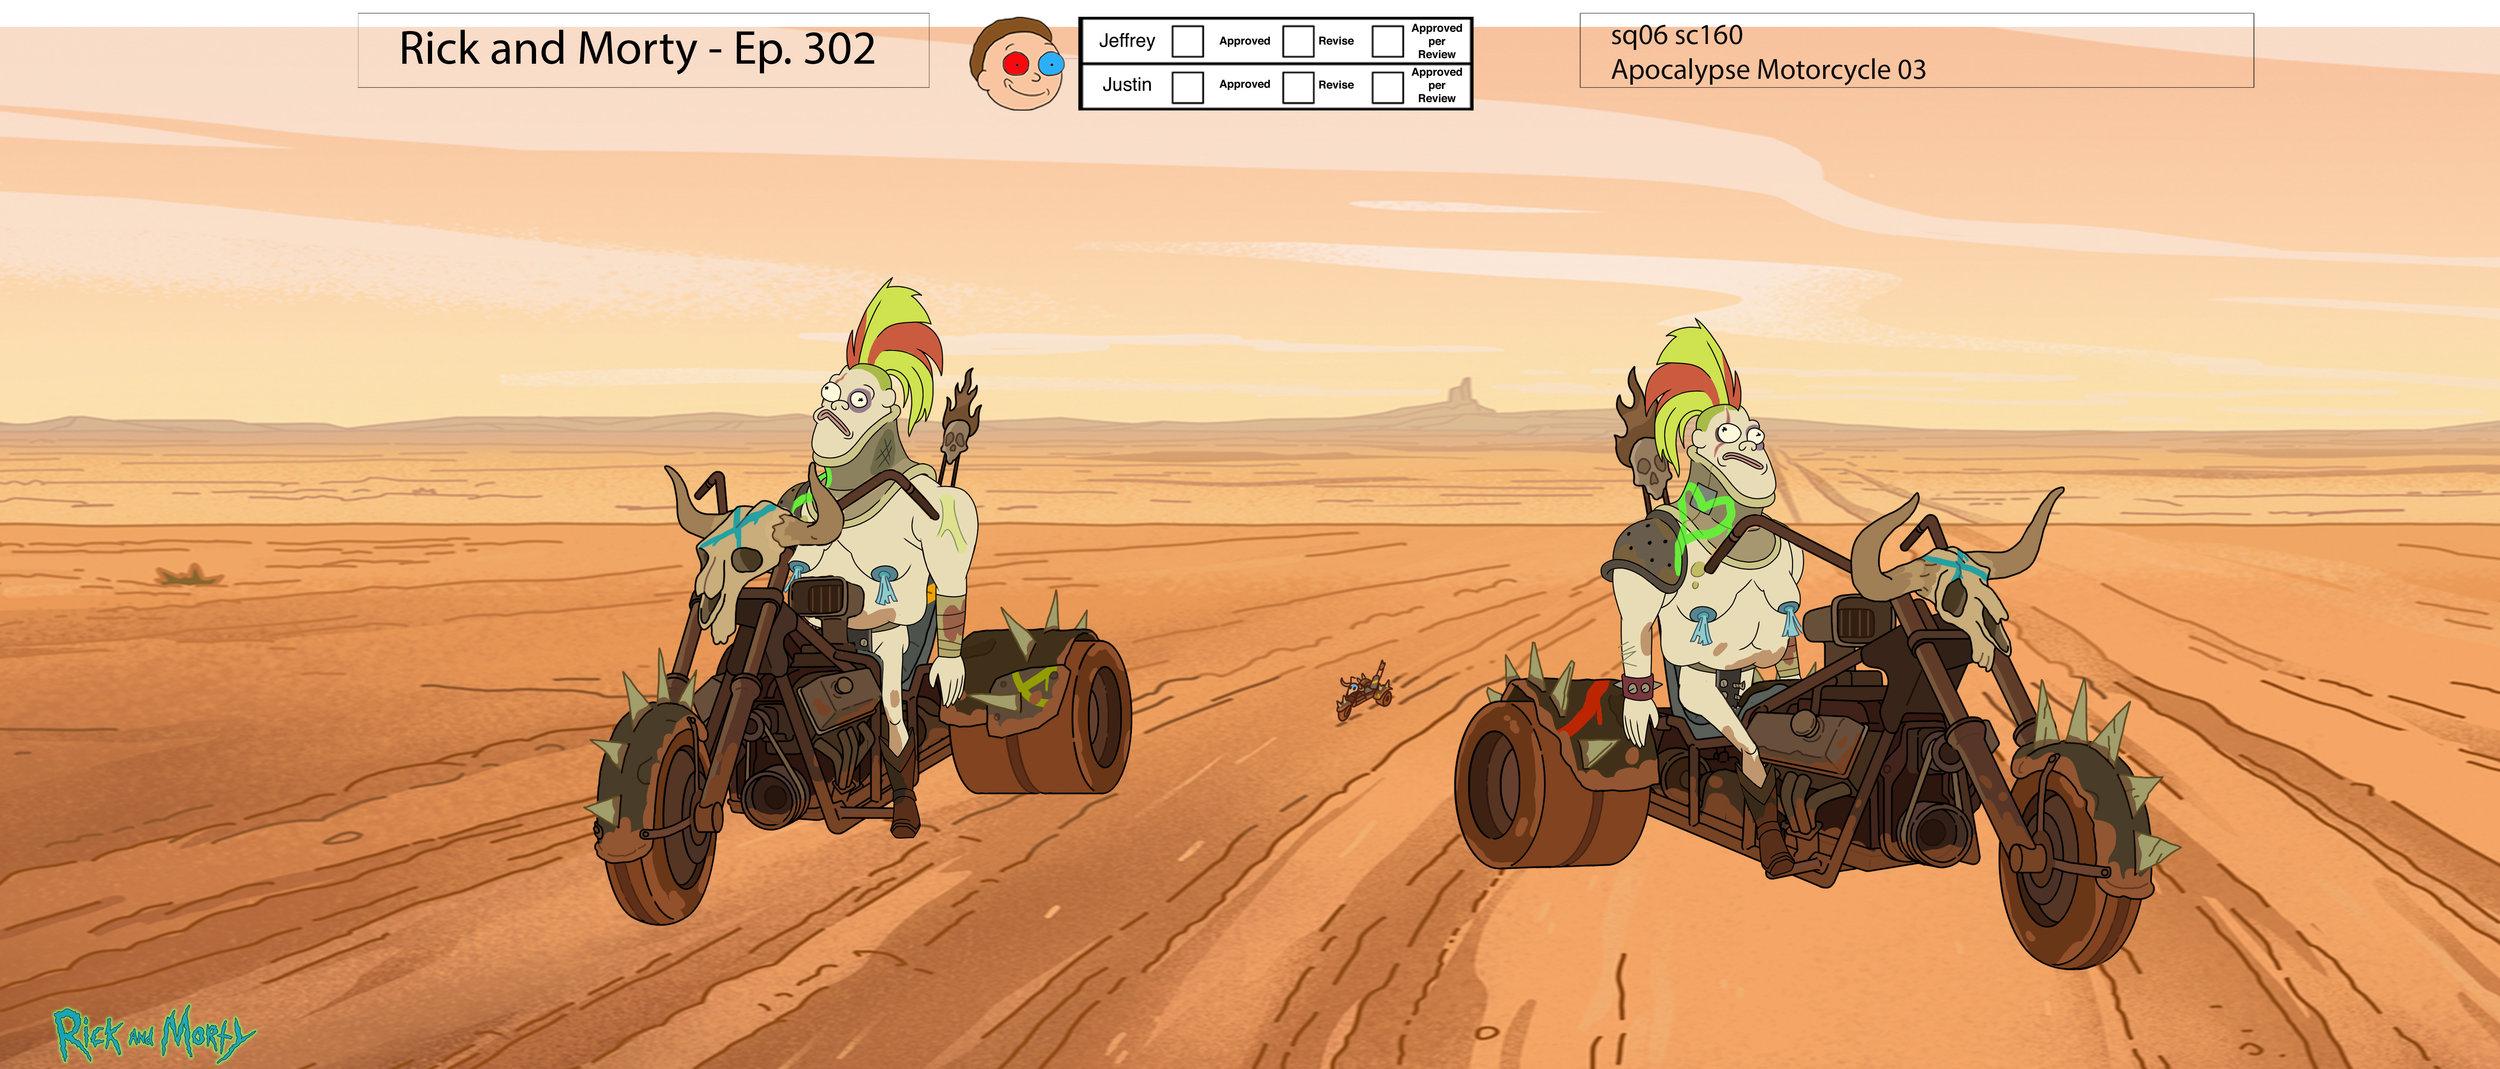 302_PR_sq06sc159_Apocalypse_Motorcycle_03_Color_V1_CB.jpg